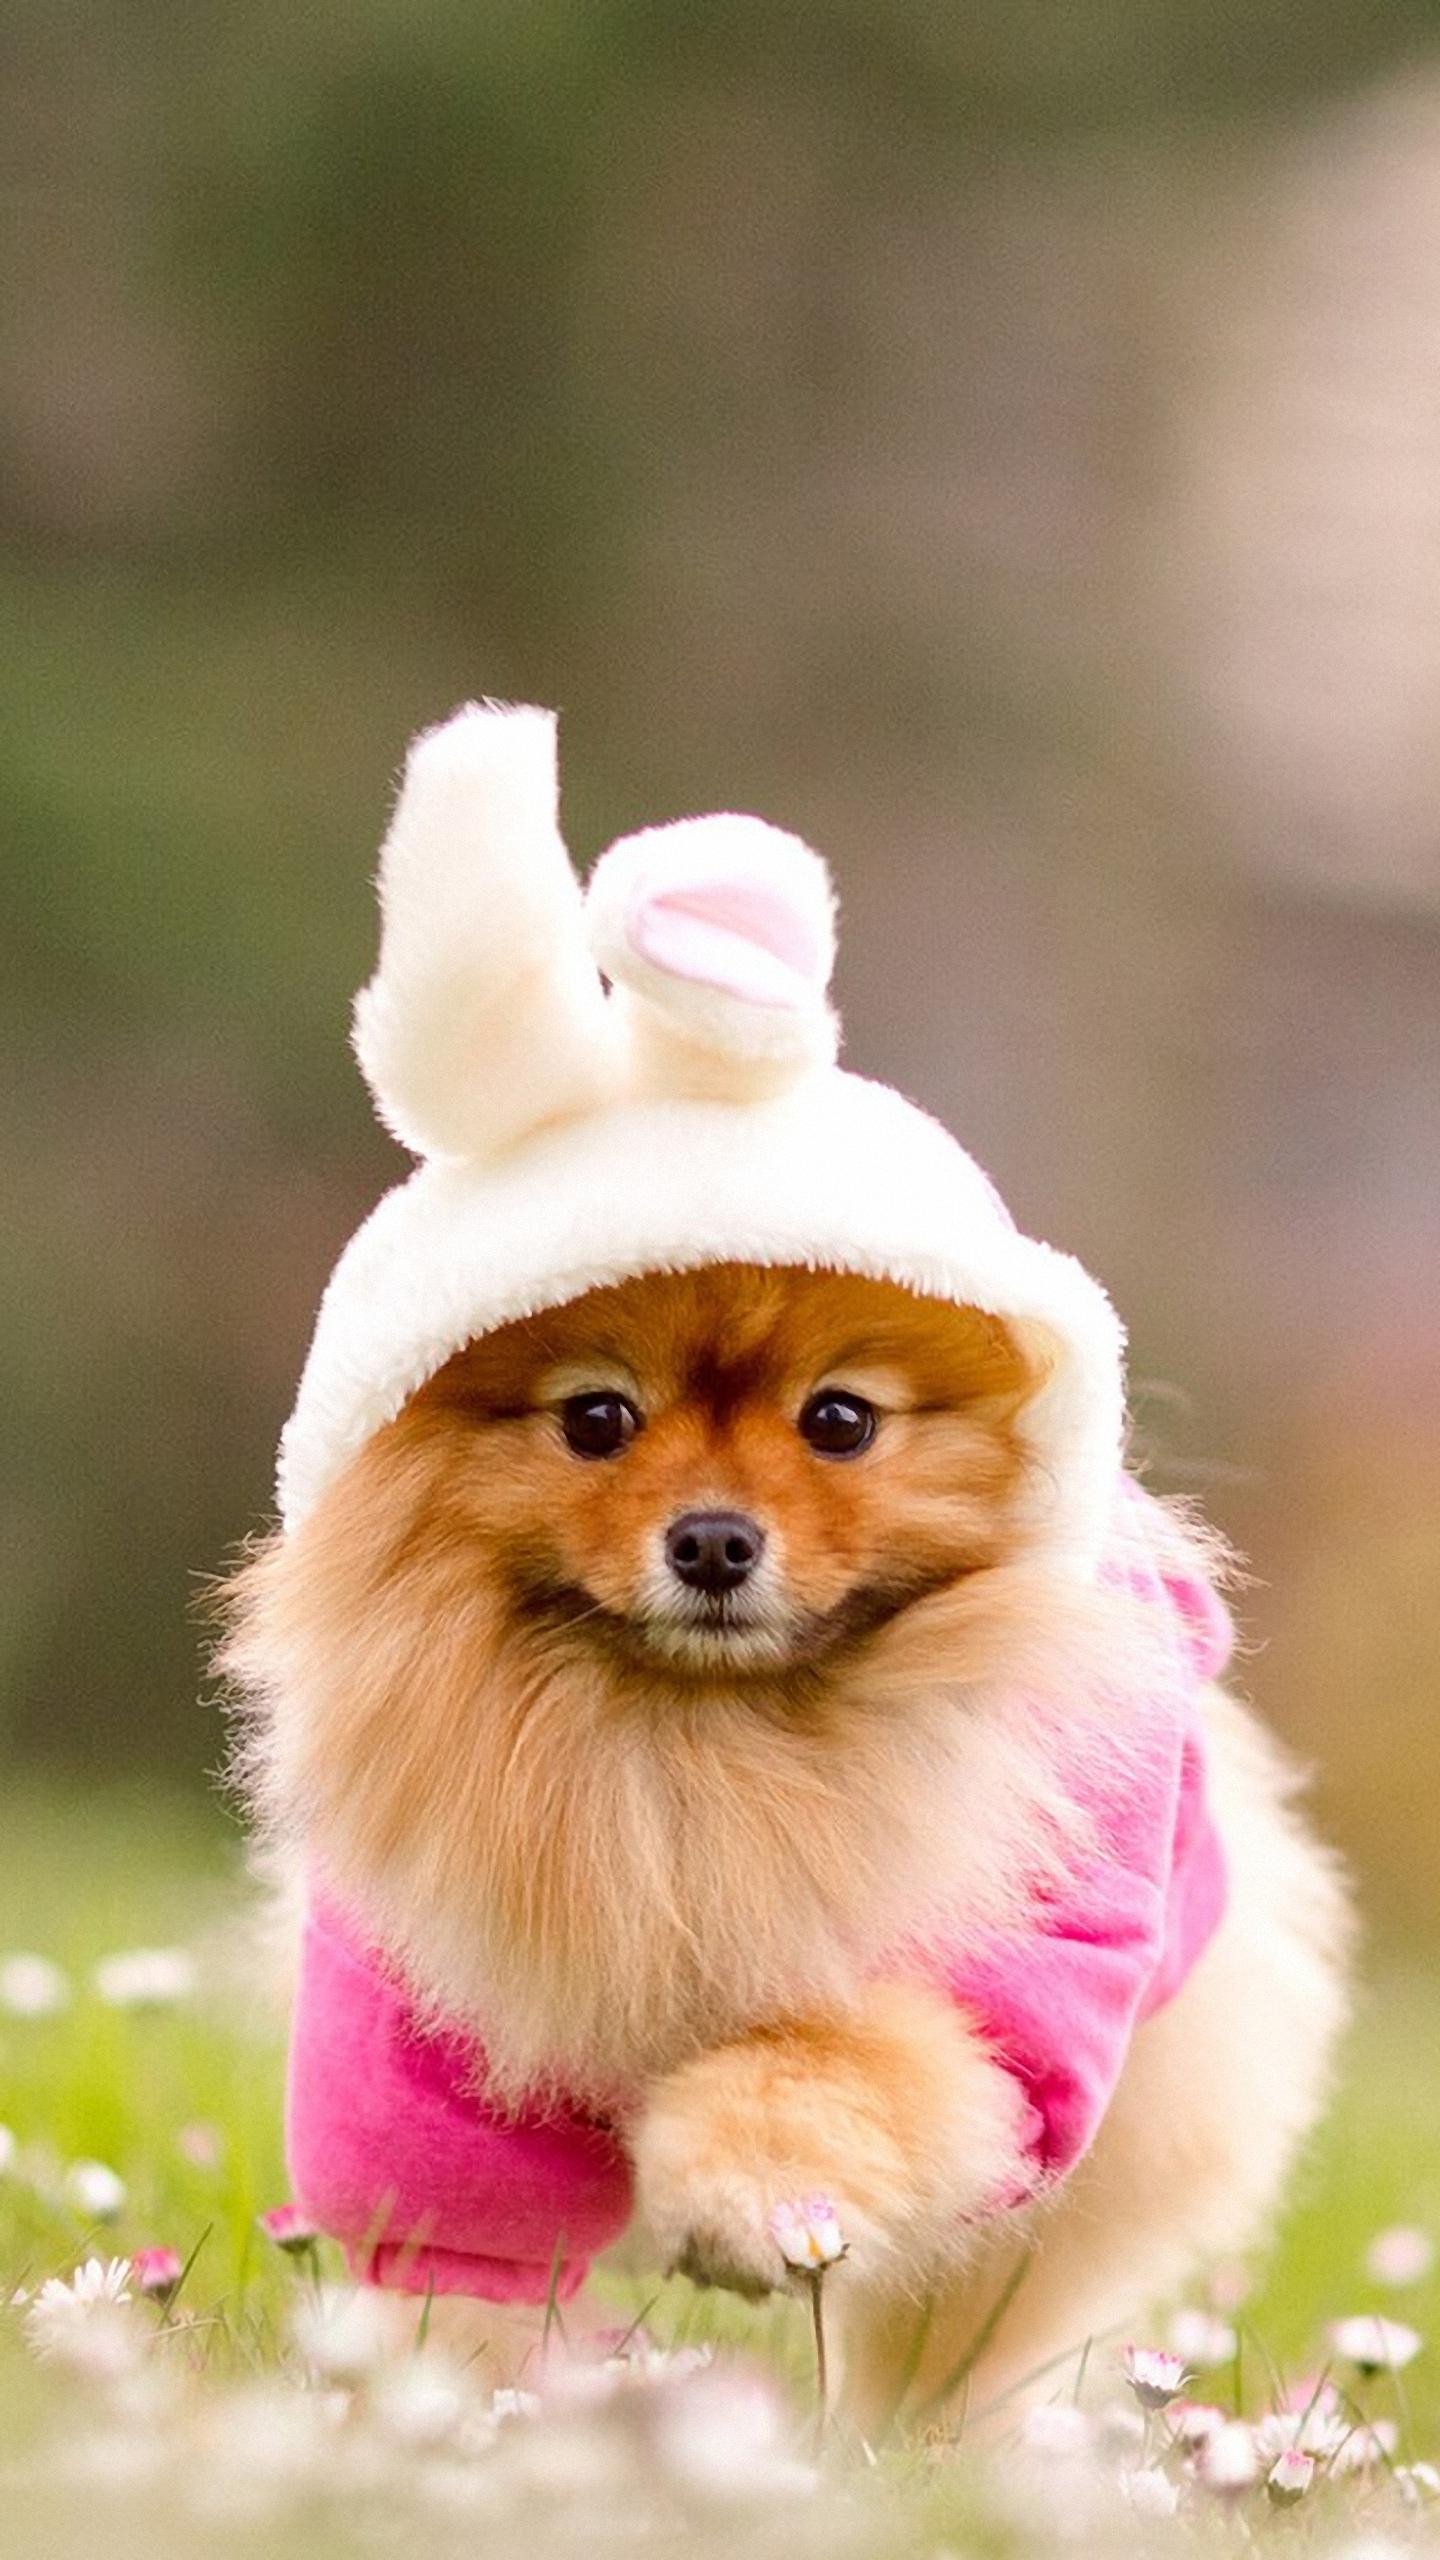 Photos Cute Phone Backgrounds Cute Dog Wallpaper Iphone 842713